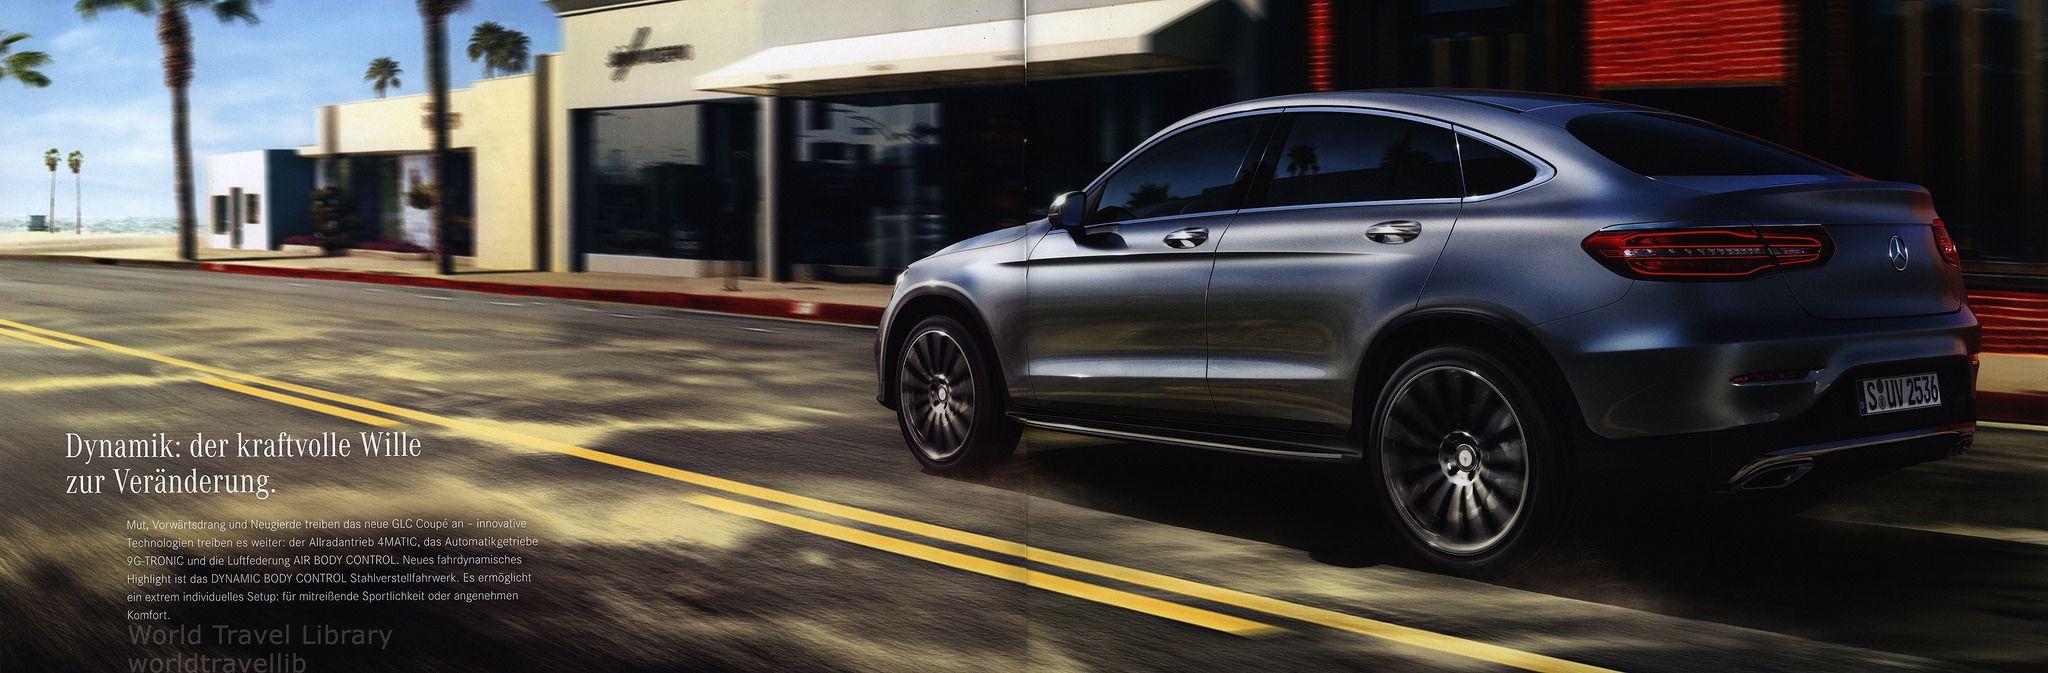 https://flic.kr/p/S7NJ3U | Mercedes-Benz GLC Coupé; 2016_2